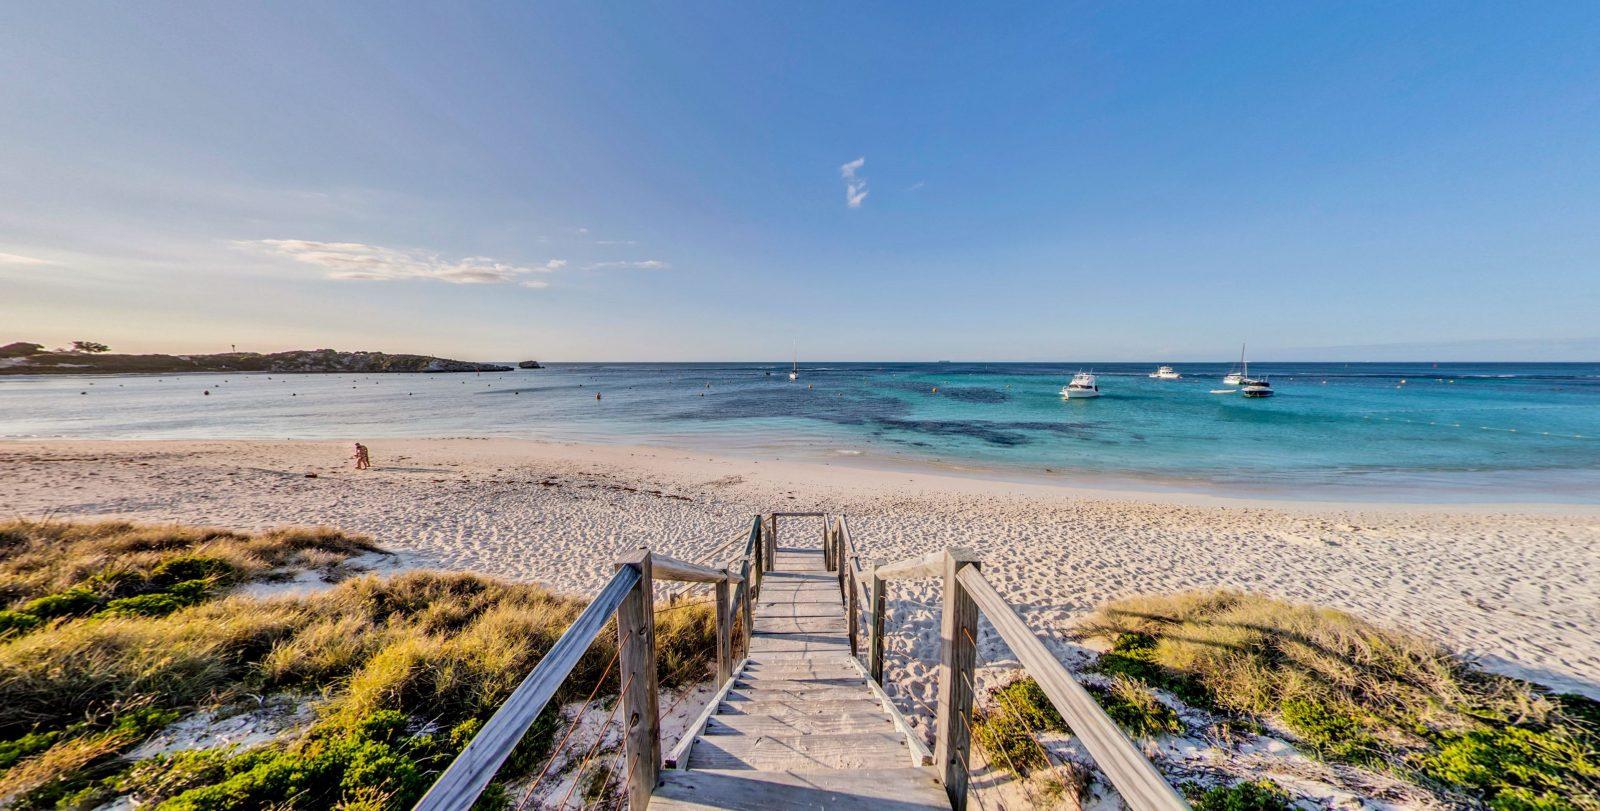 Rottnest Express, Rottnest, Western Australia